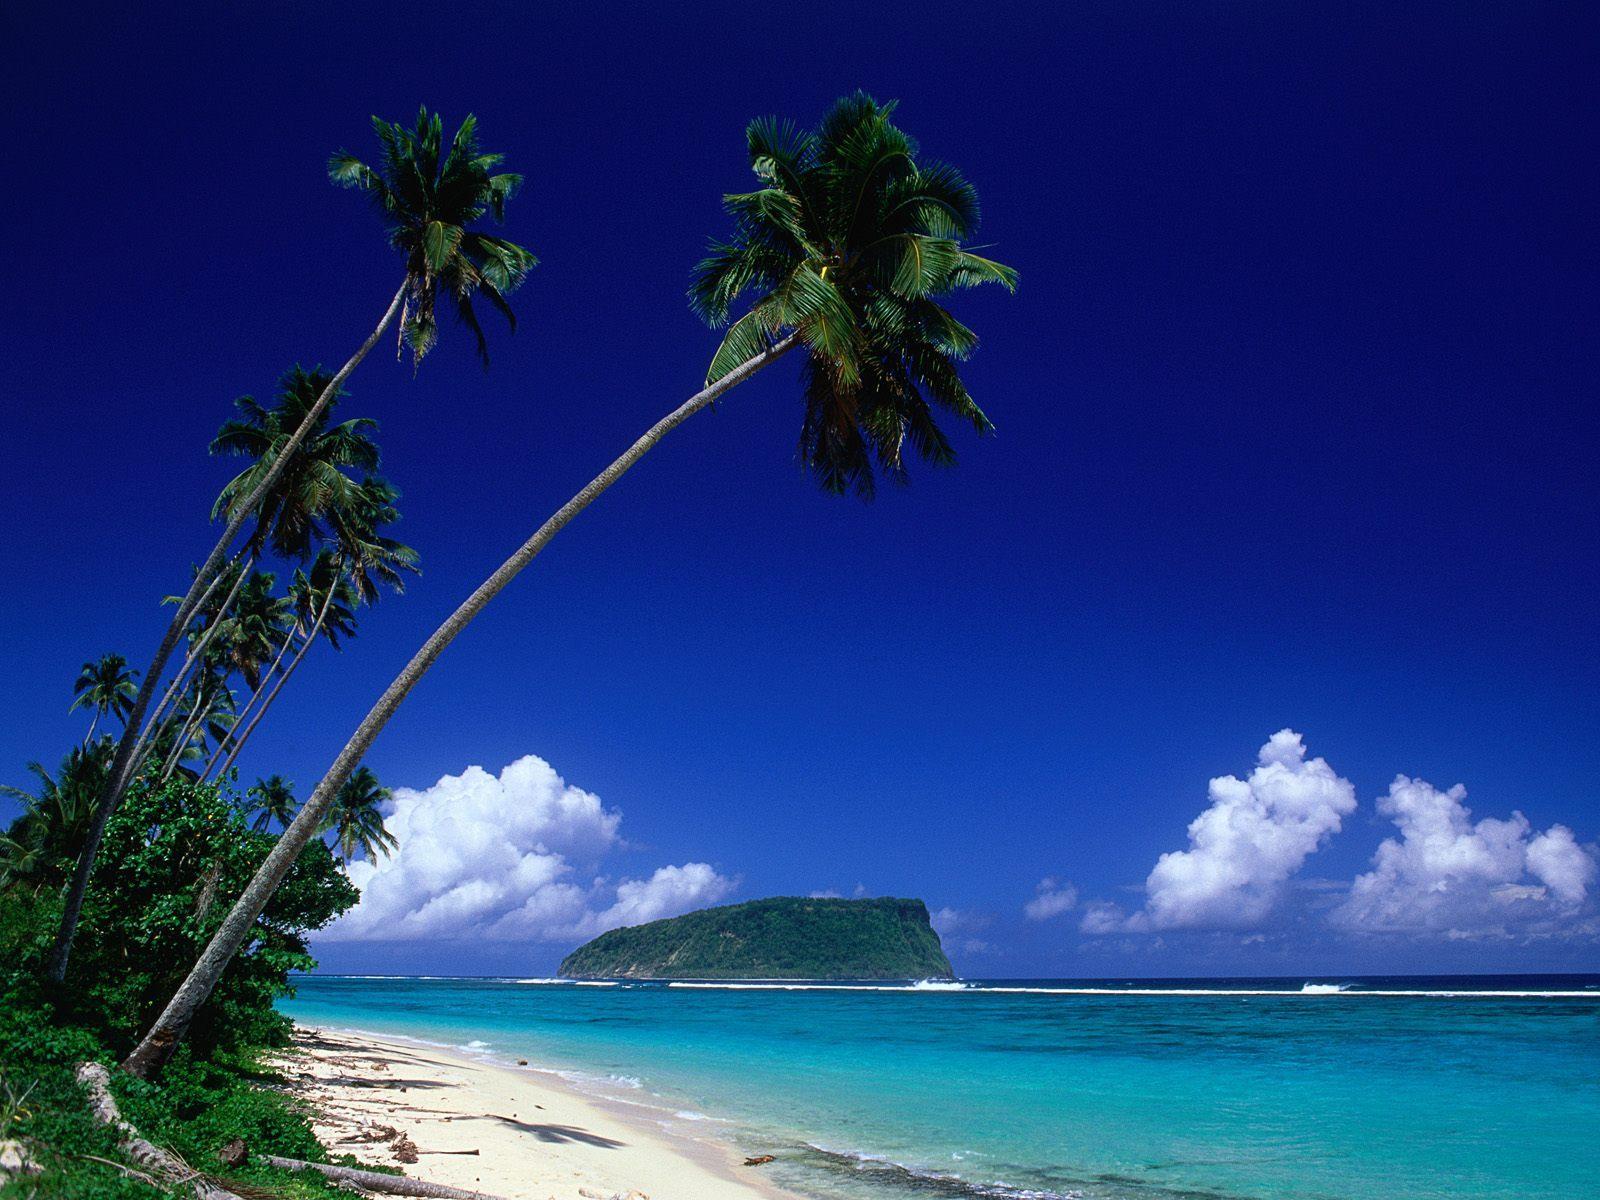 Samoan Dreaming with Hosanna (Etina) on Koori Radio